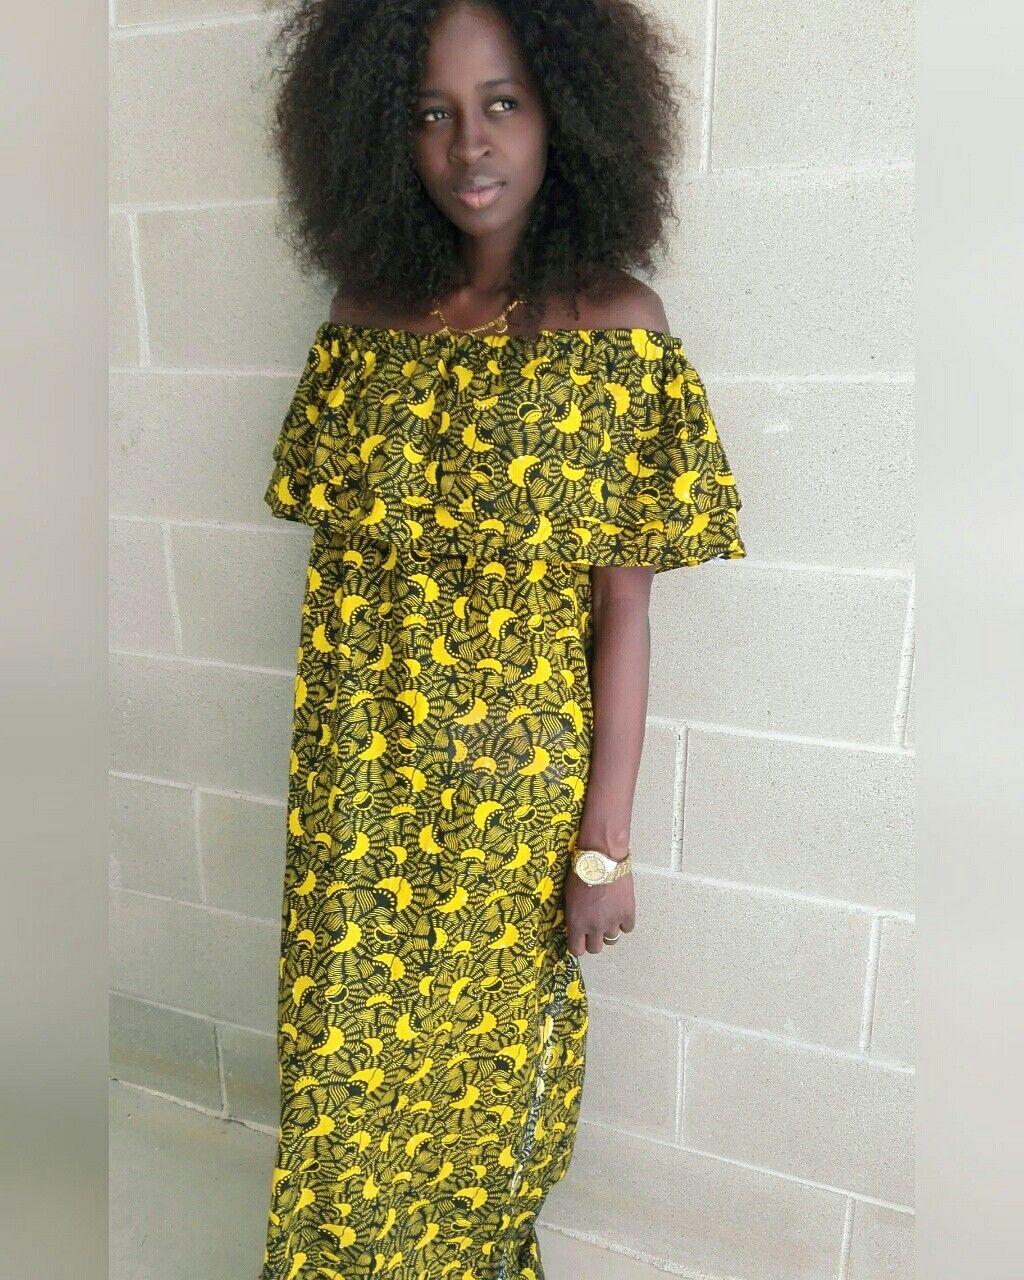 Longdress~ africanprint~ my own creation